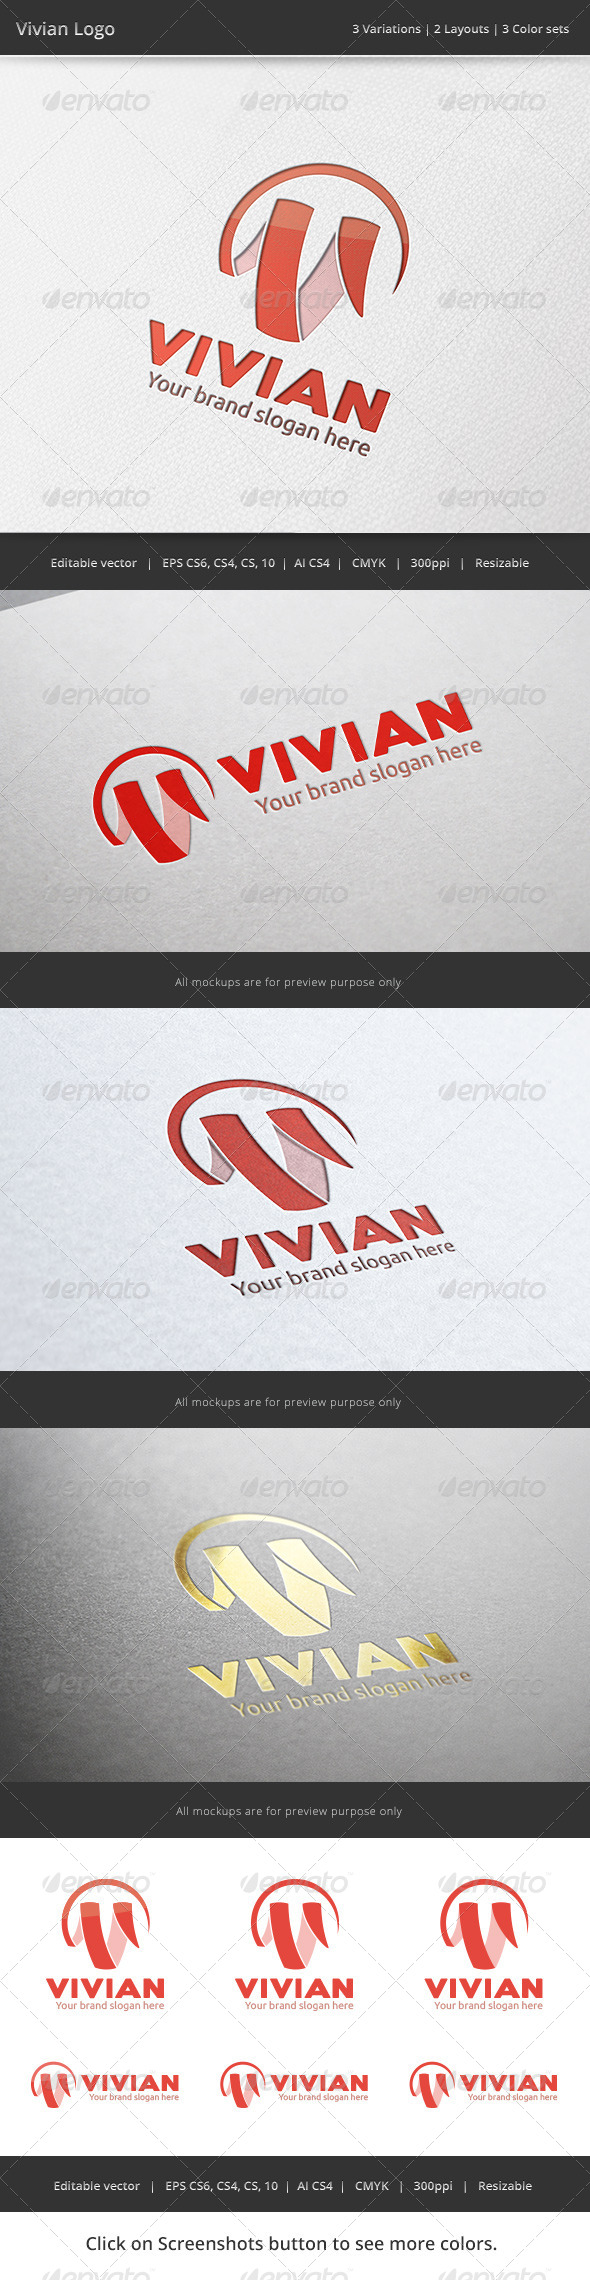 GraphicRiver Vivian V Letter Logo 7206236